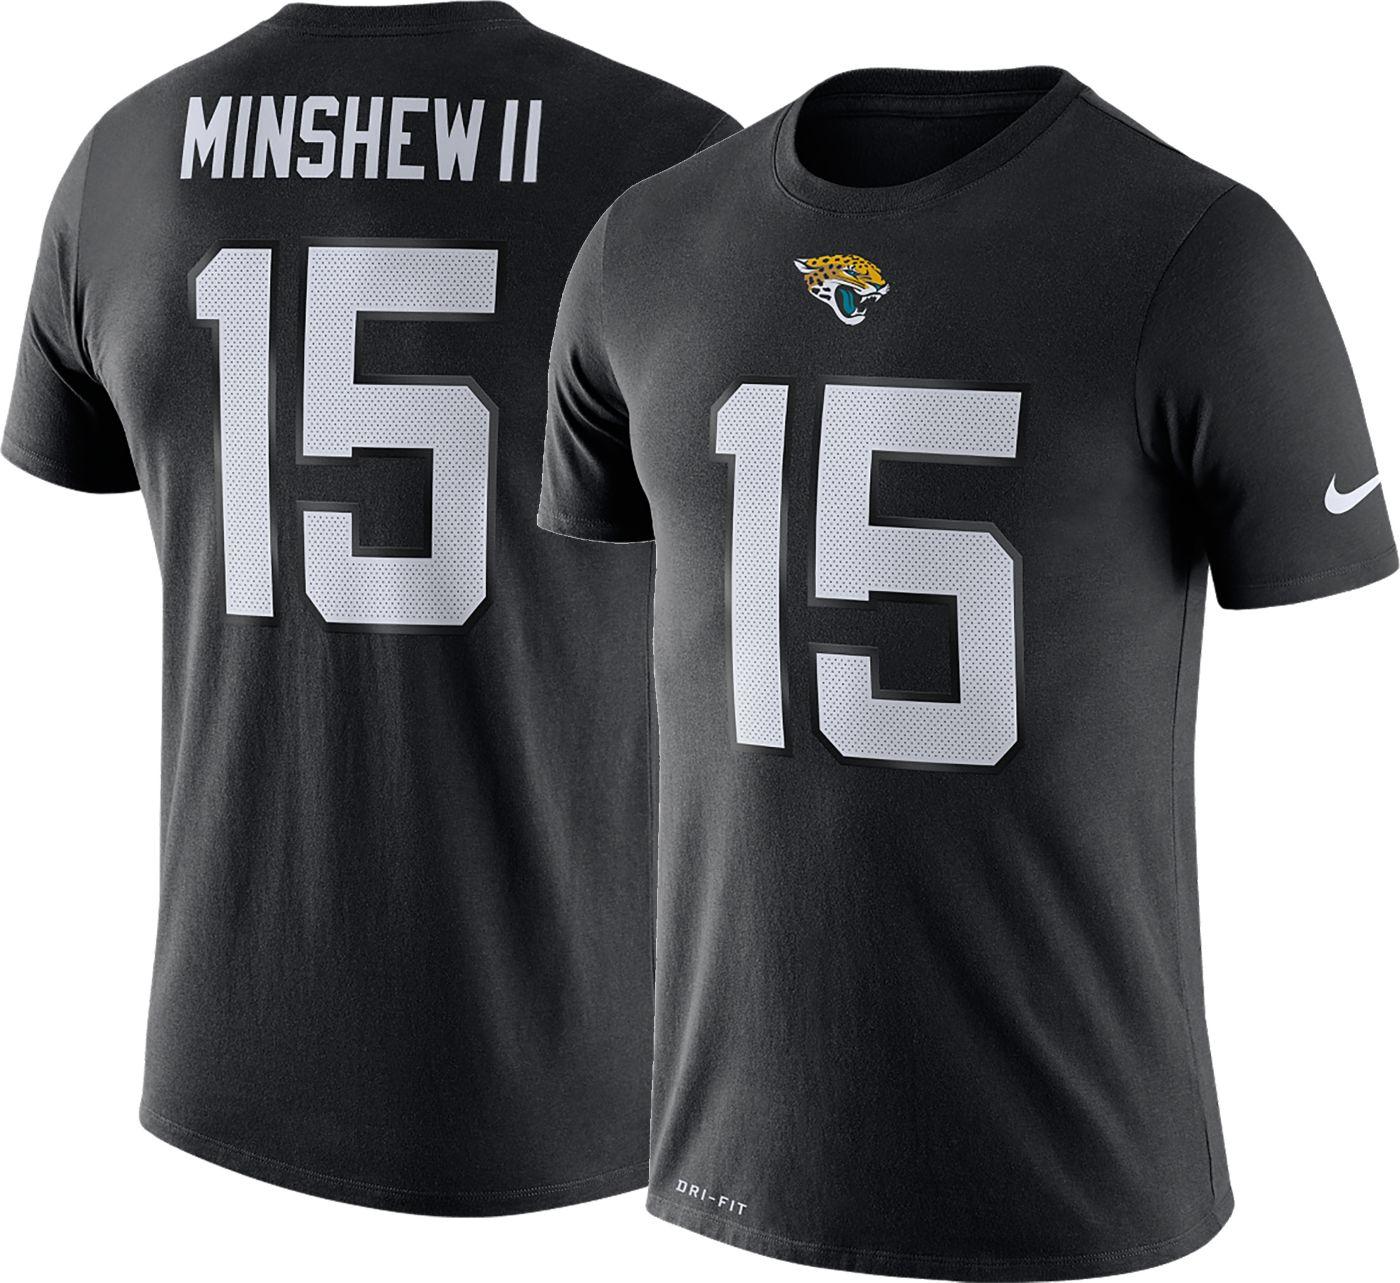 Nike Men's Jacksonville Jaguars Gardner Minshew II #15 Logo Black T-Shirt